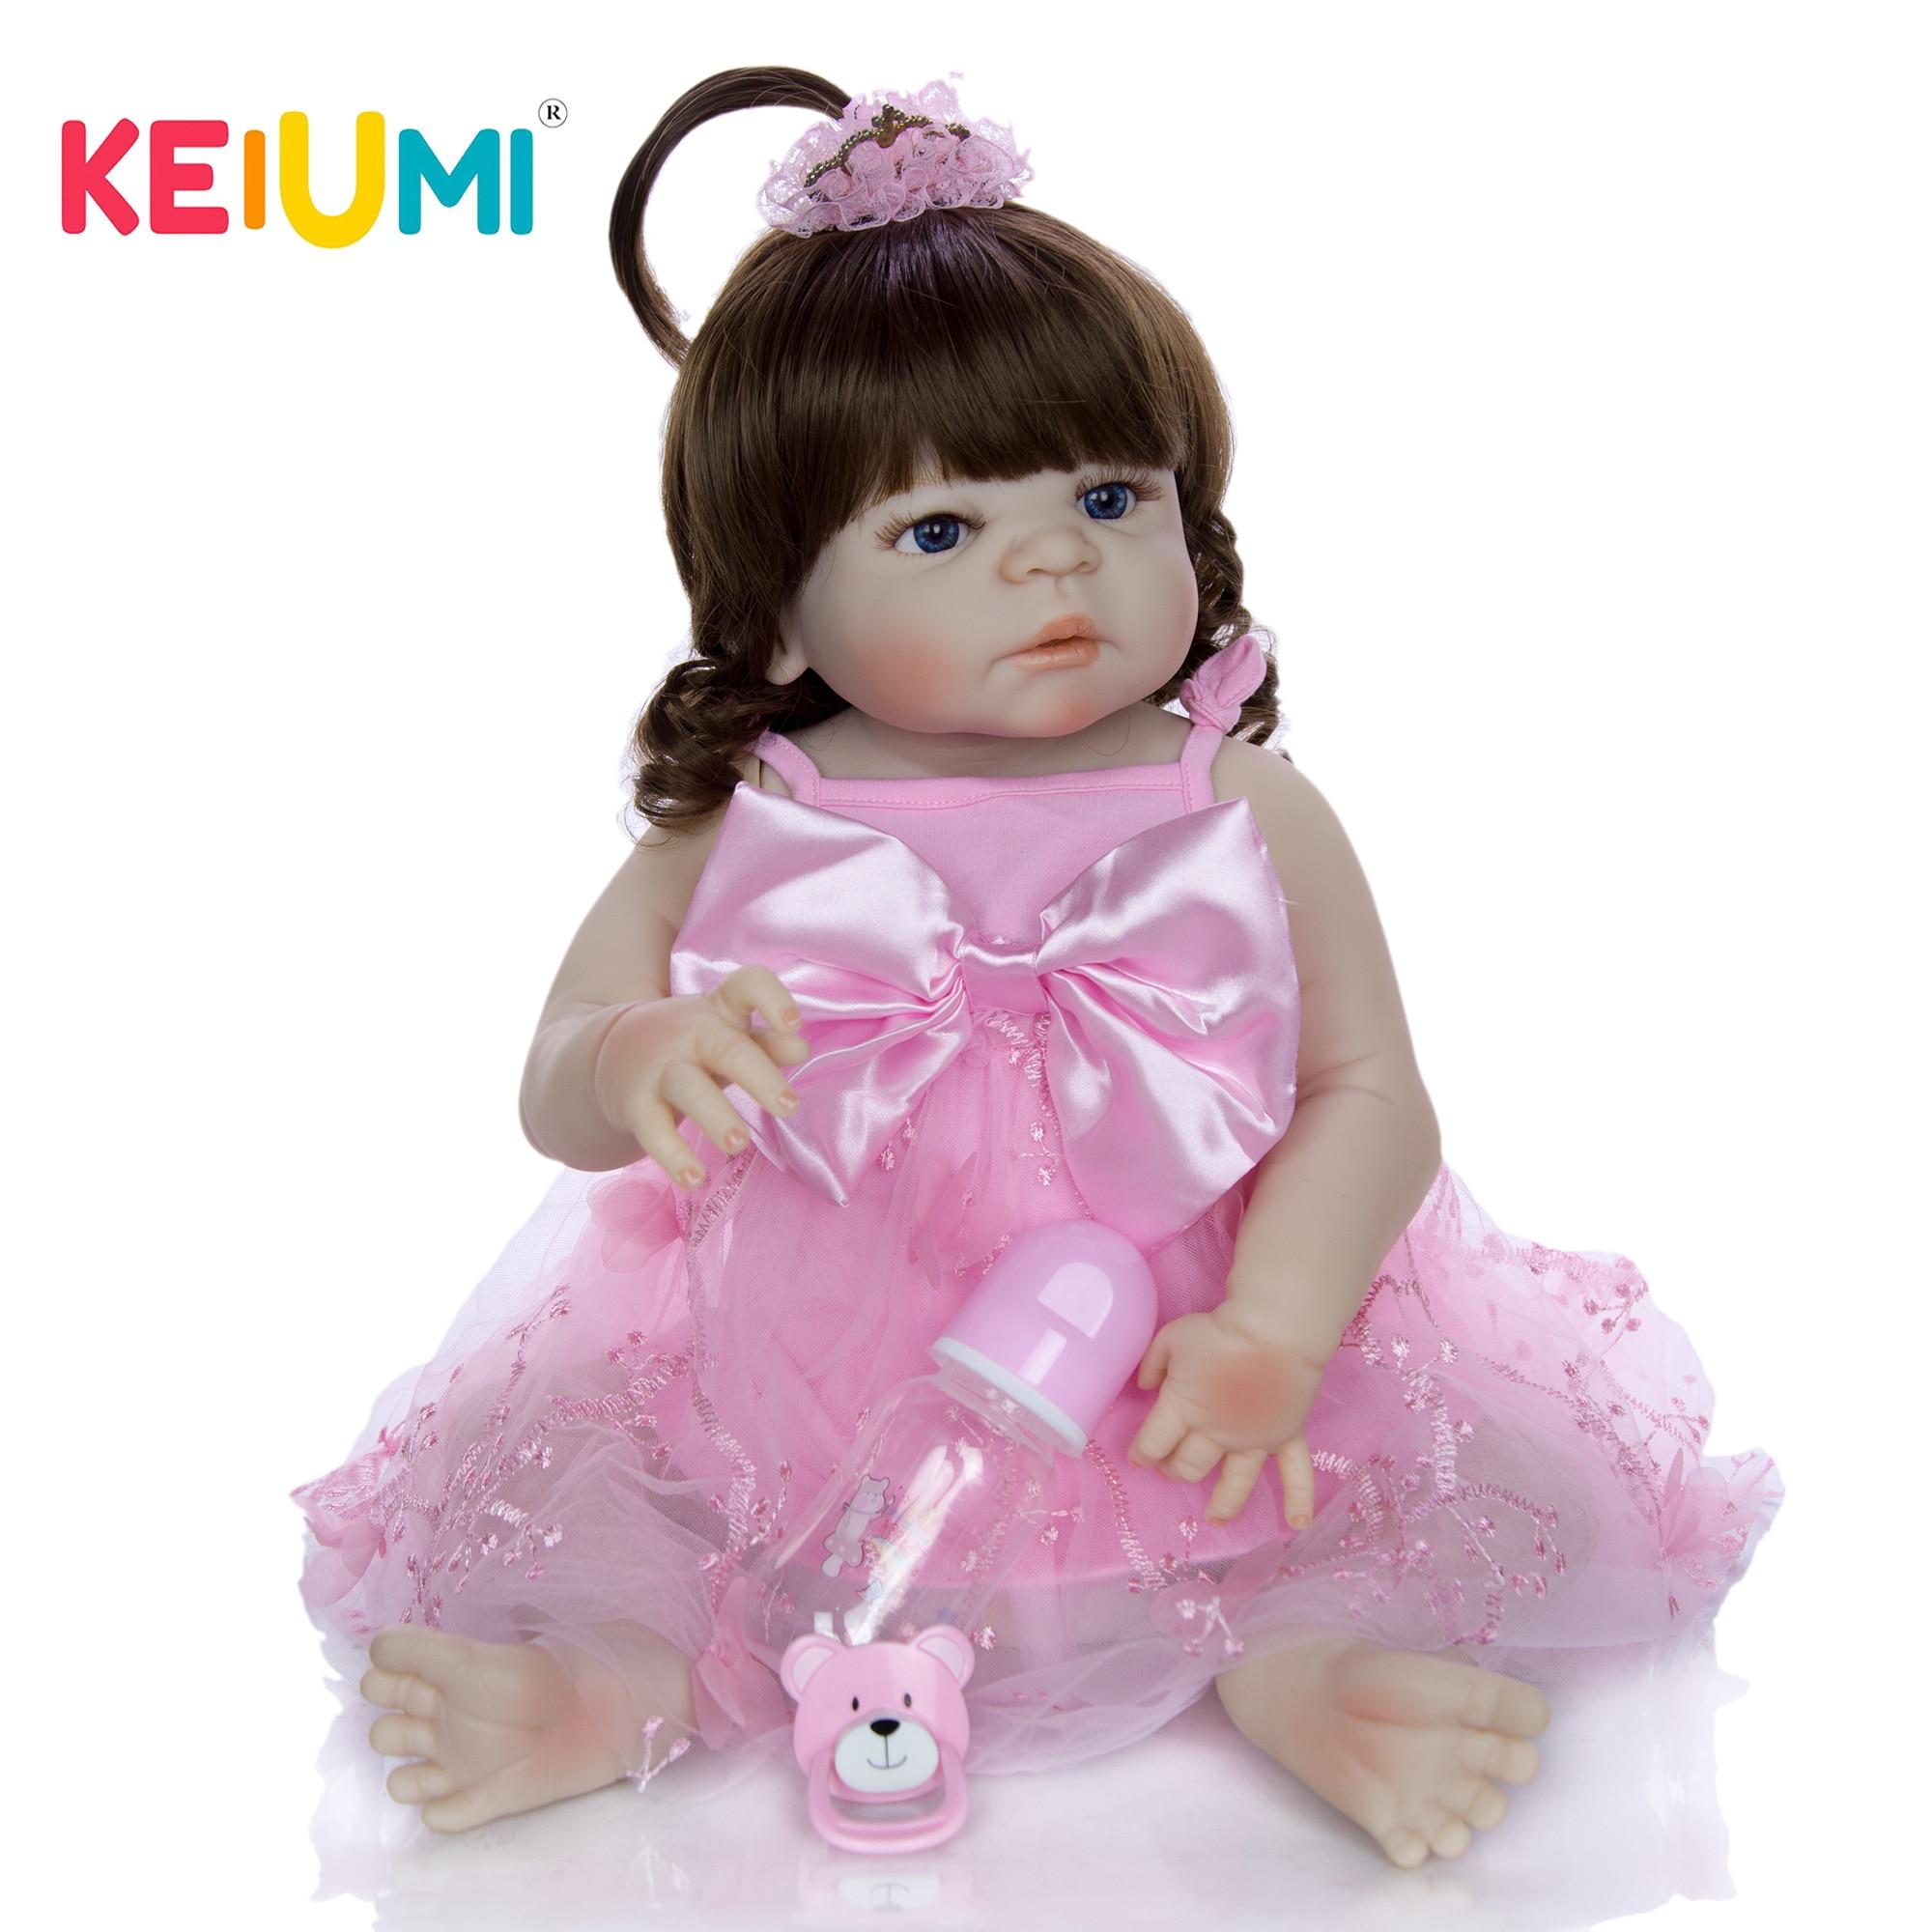 Lovely Reborn Bonecas Menina Toys 23 Full Silicone Vinyl Newborn Dolls Realistic Babies Reborn Dolls Lifelike